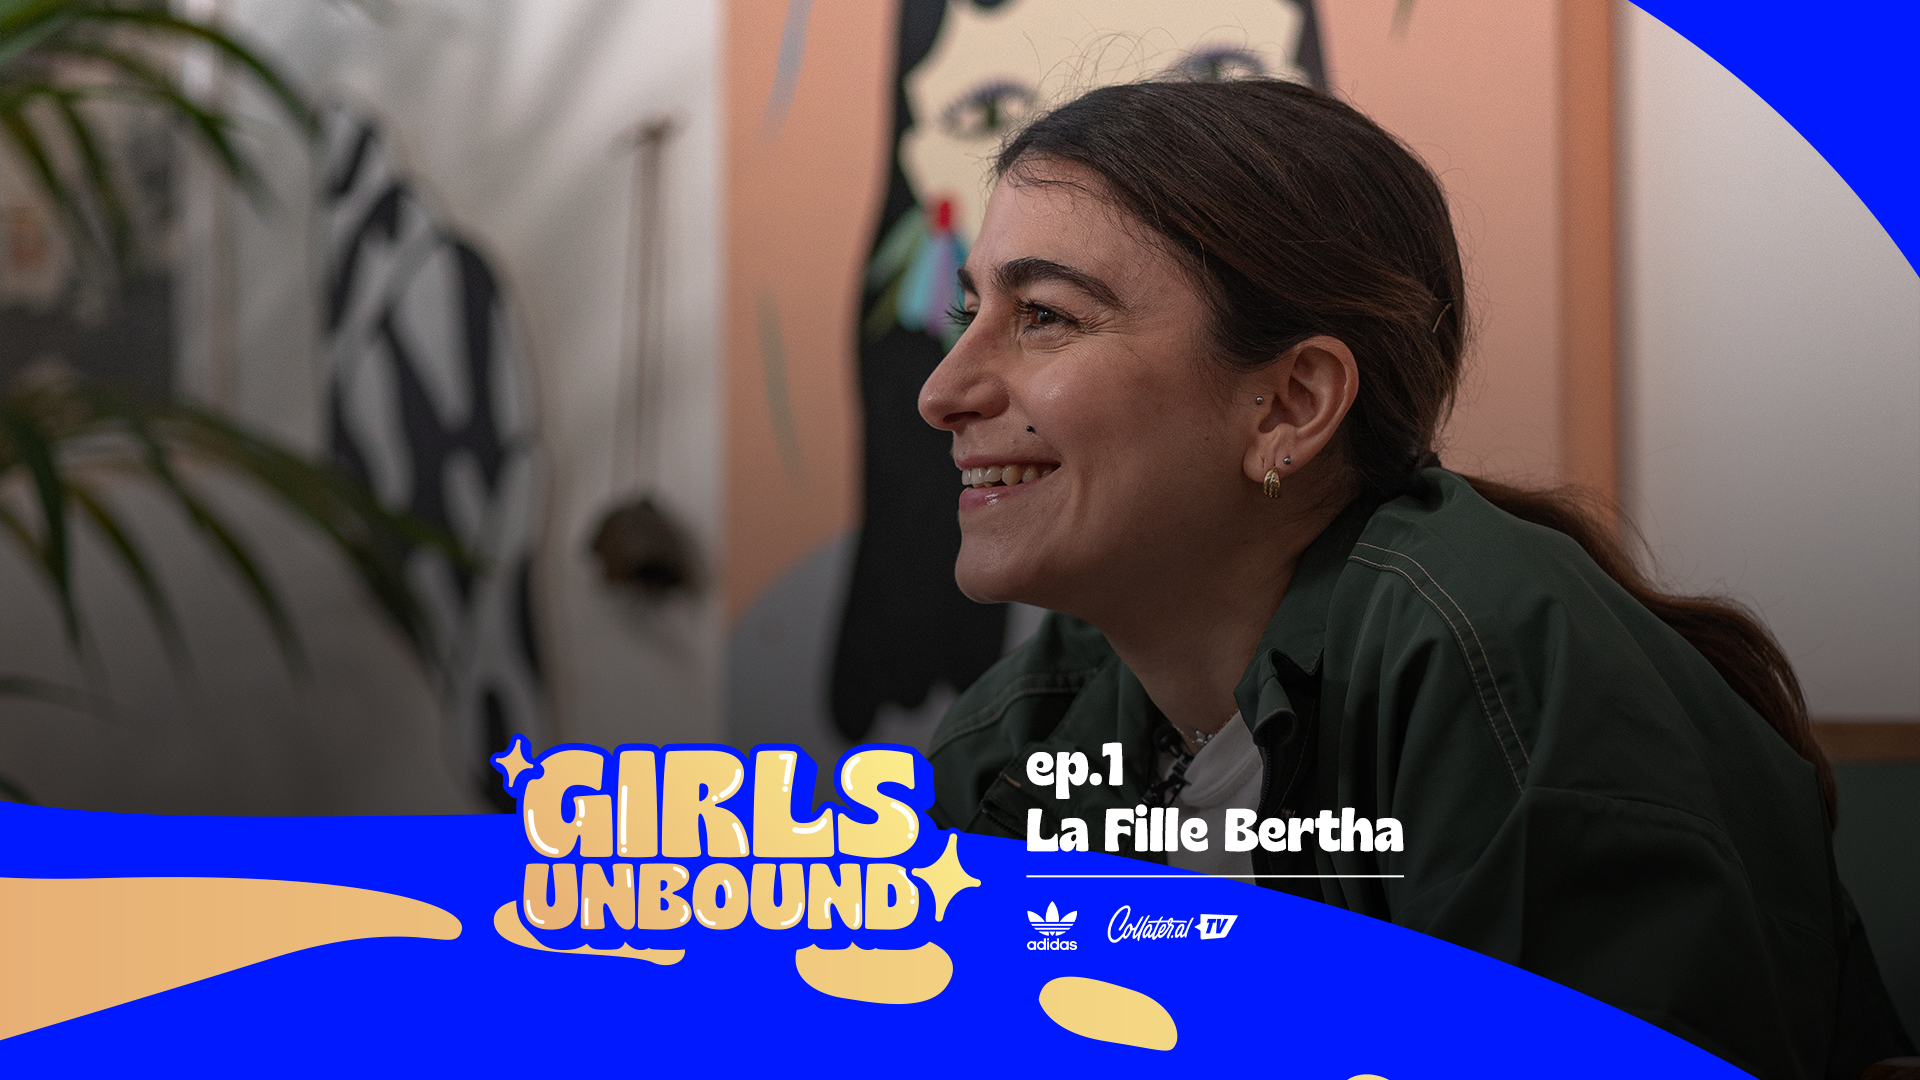 Girls Unbound | Carlo Pastore intervista La Fille Bertha – Ep. 1